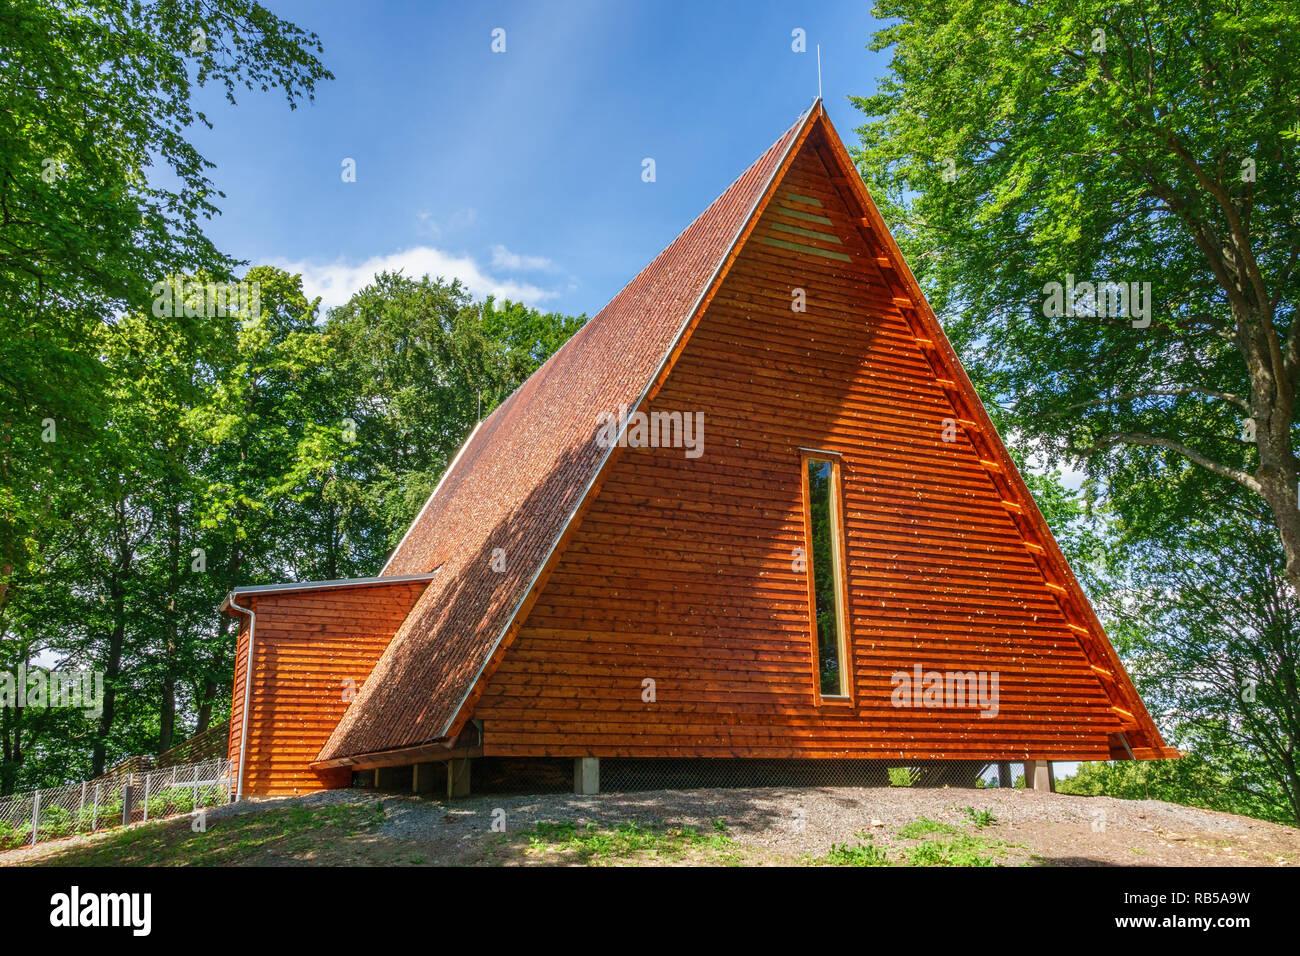 Kata farm museum building in Varnhem, Sweden - Stock Image